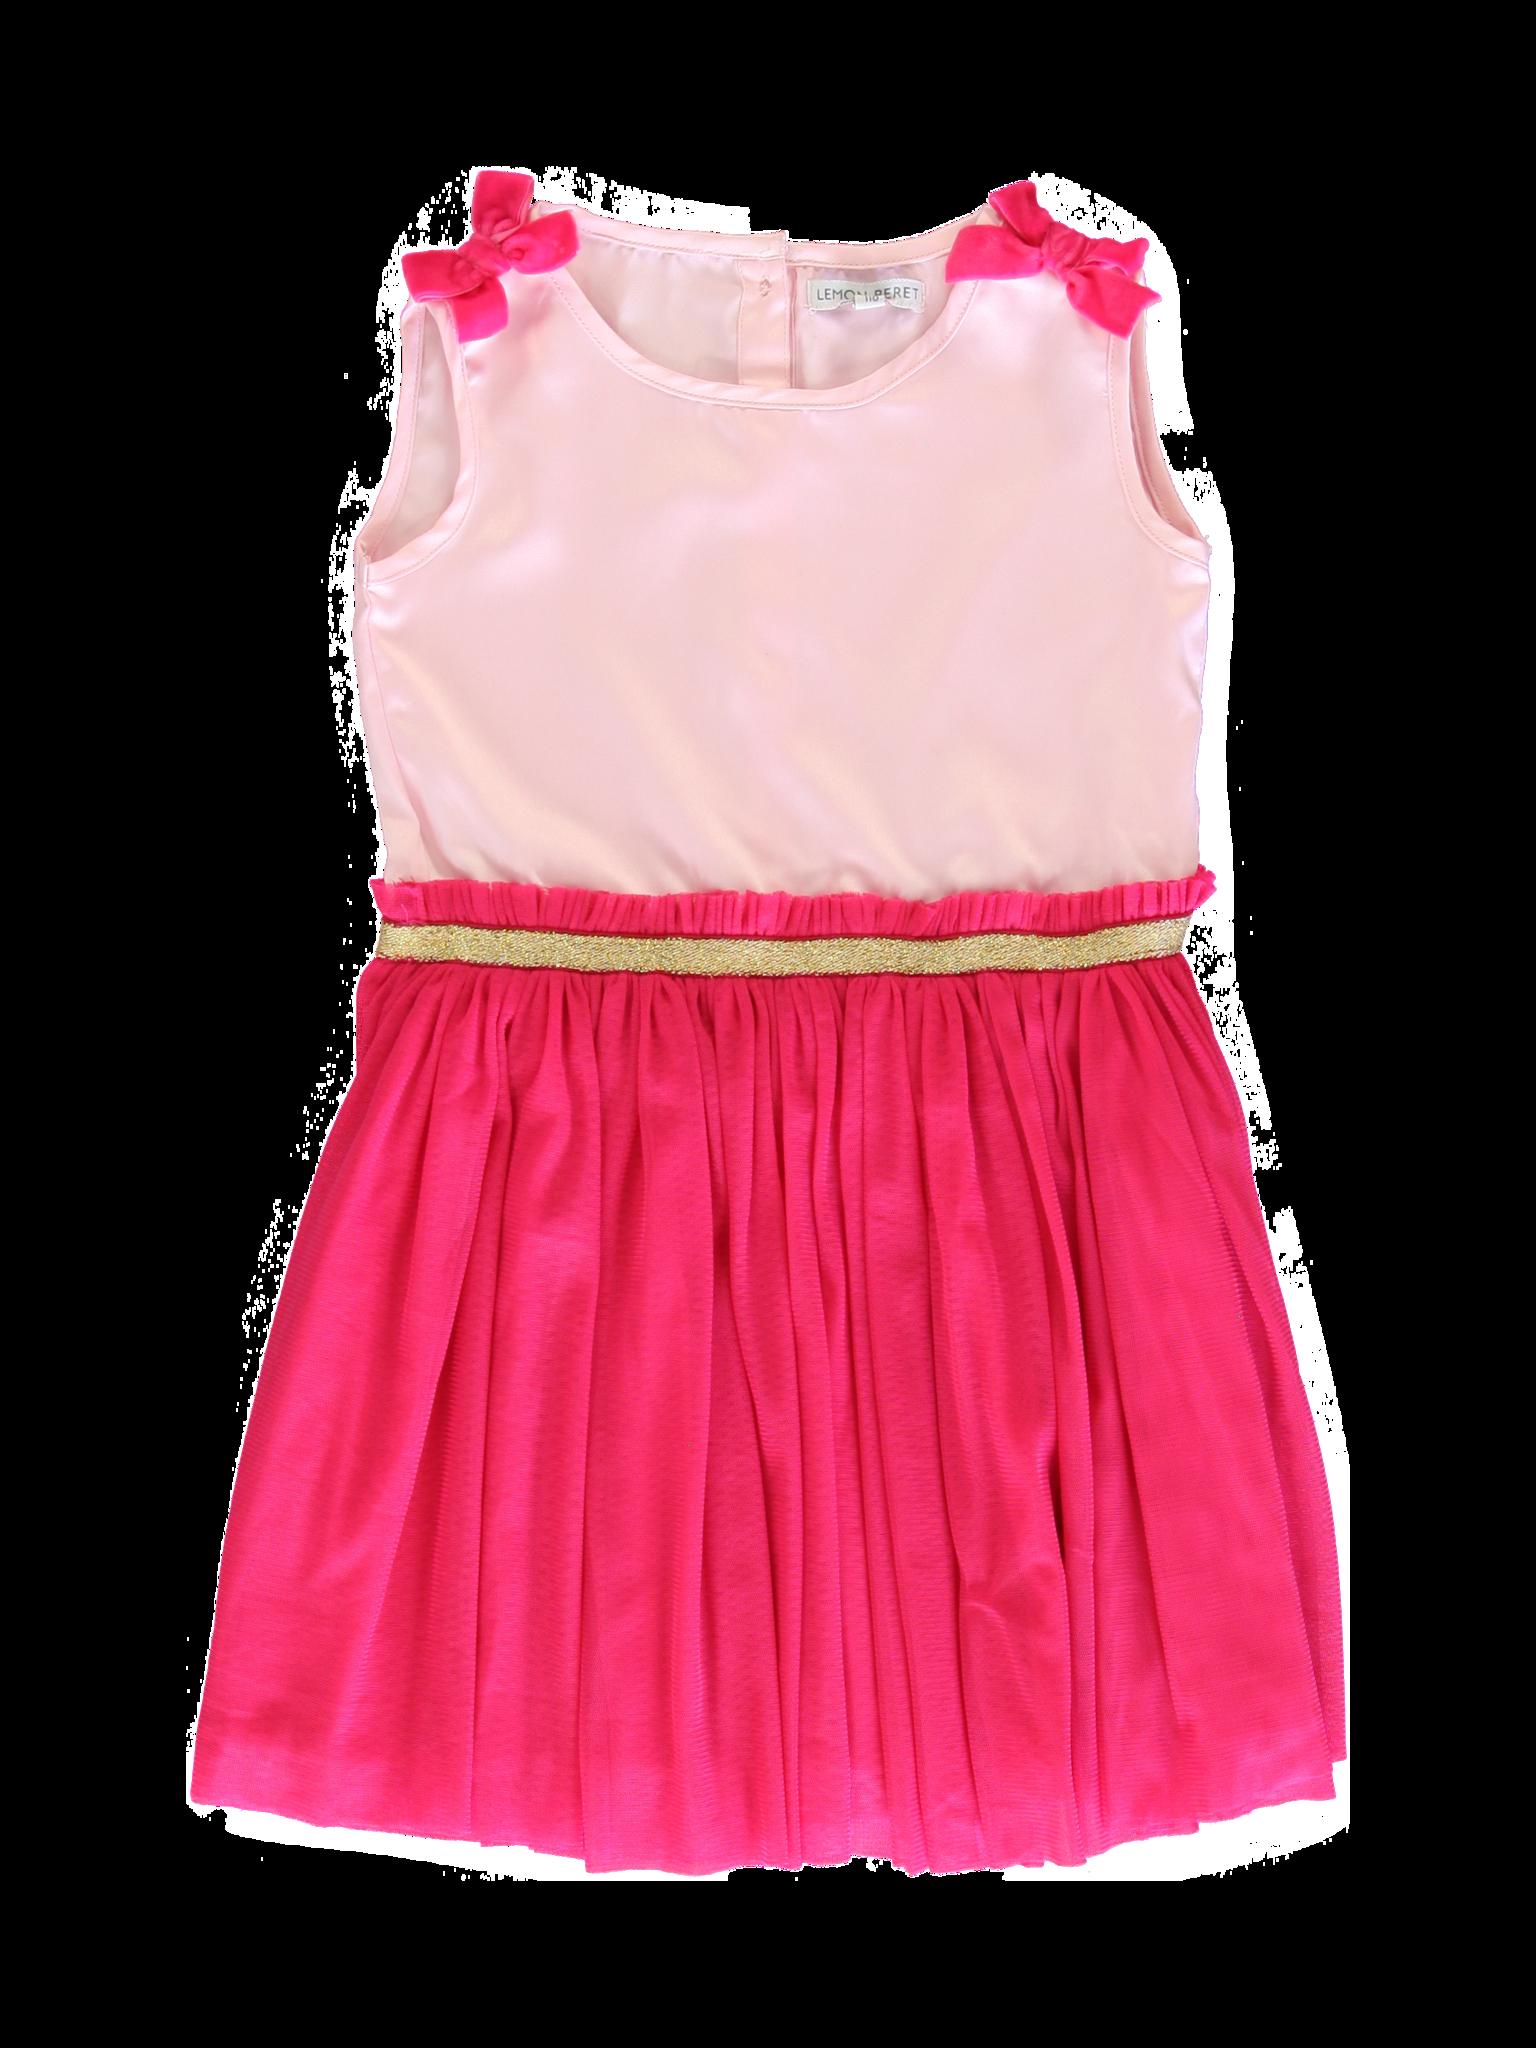 All Brands   Summerproducts Small Girls   Dress   10 pcs/box